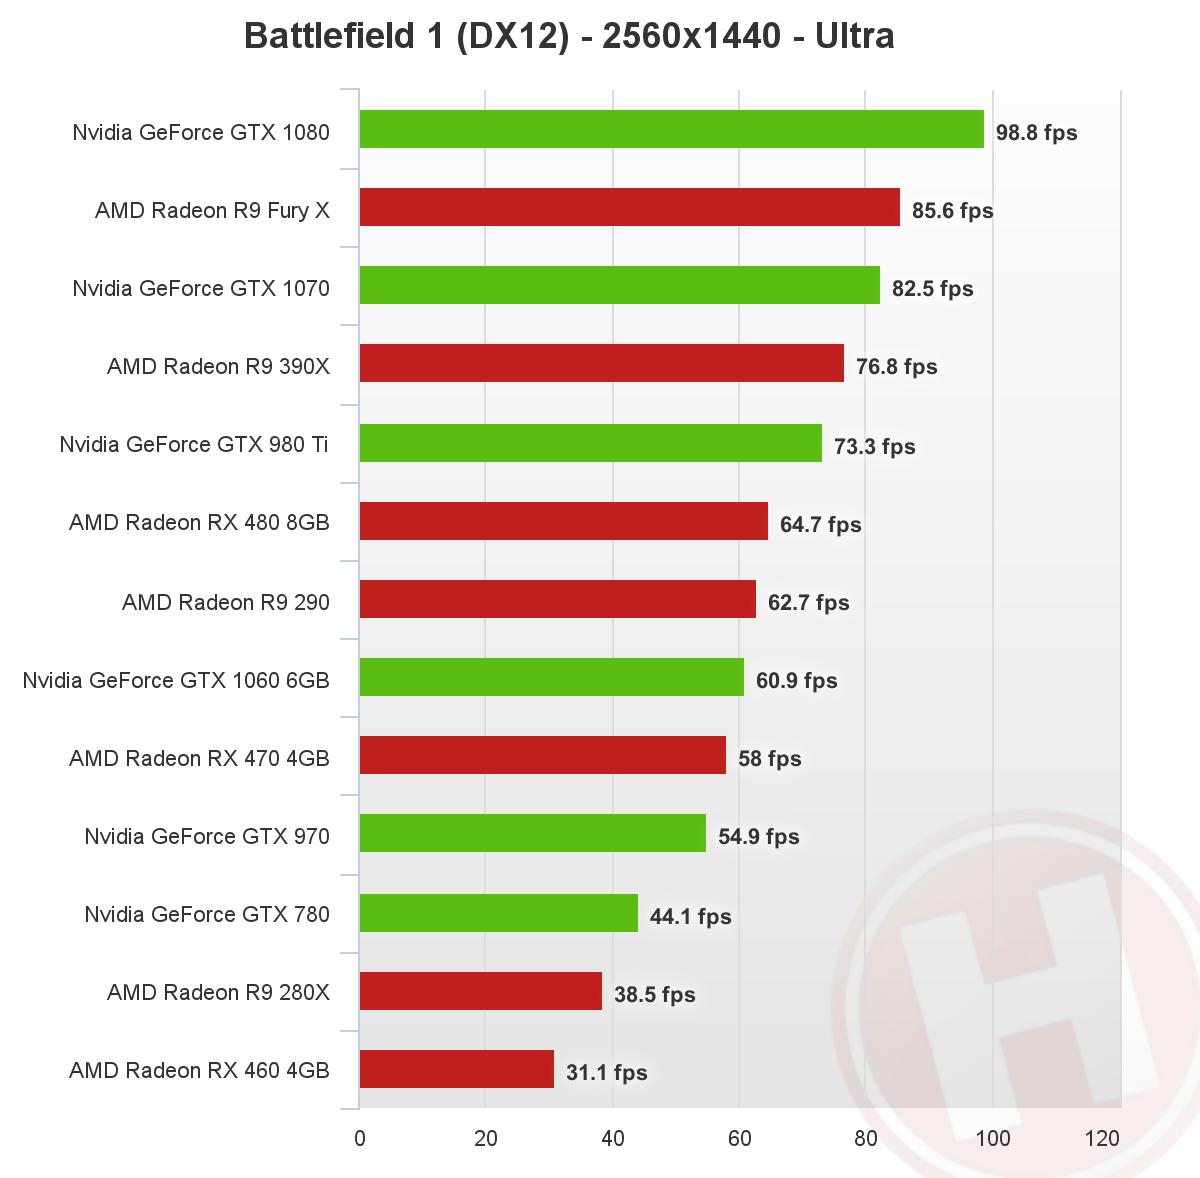 Battlefield 1 DirectX 12 Benchmarks Reveal AMD's Best Showing Yet